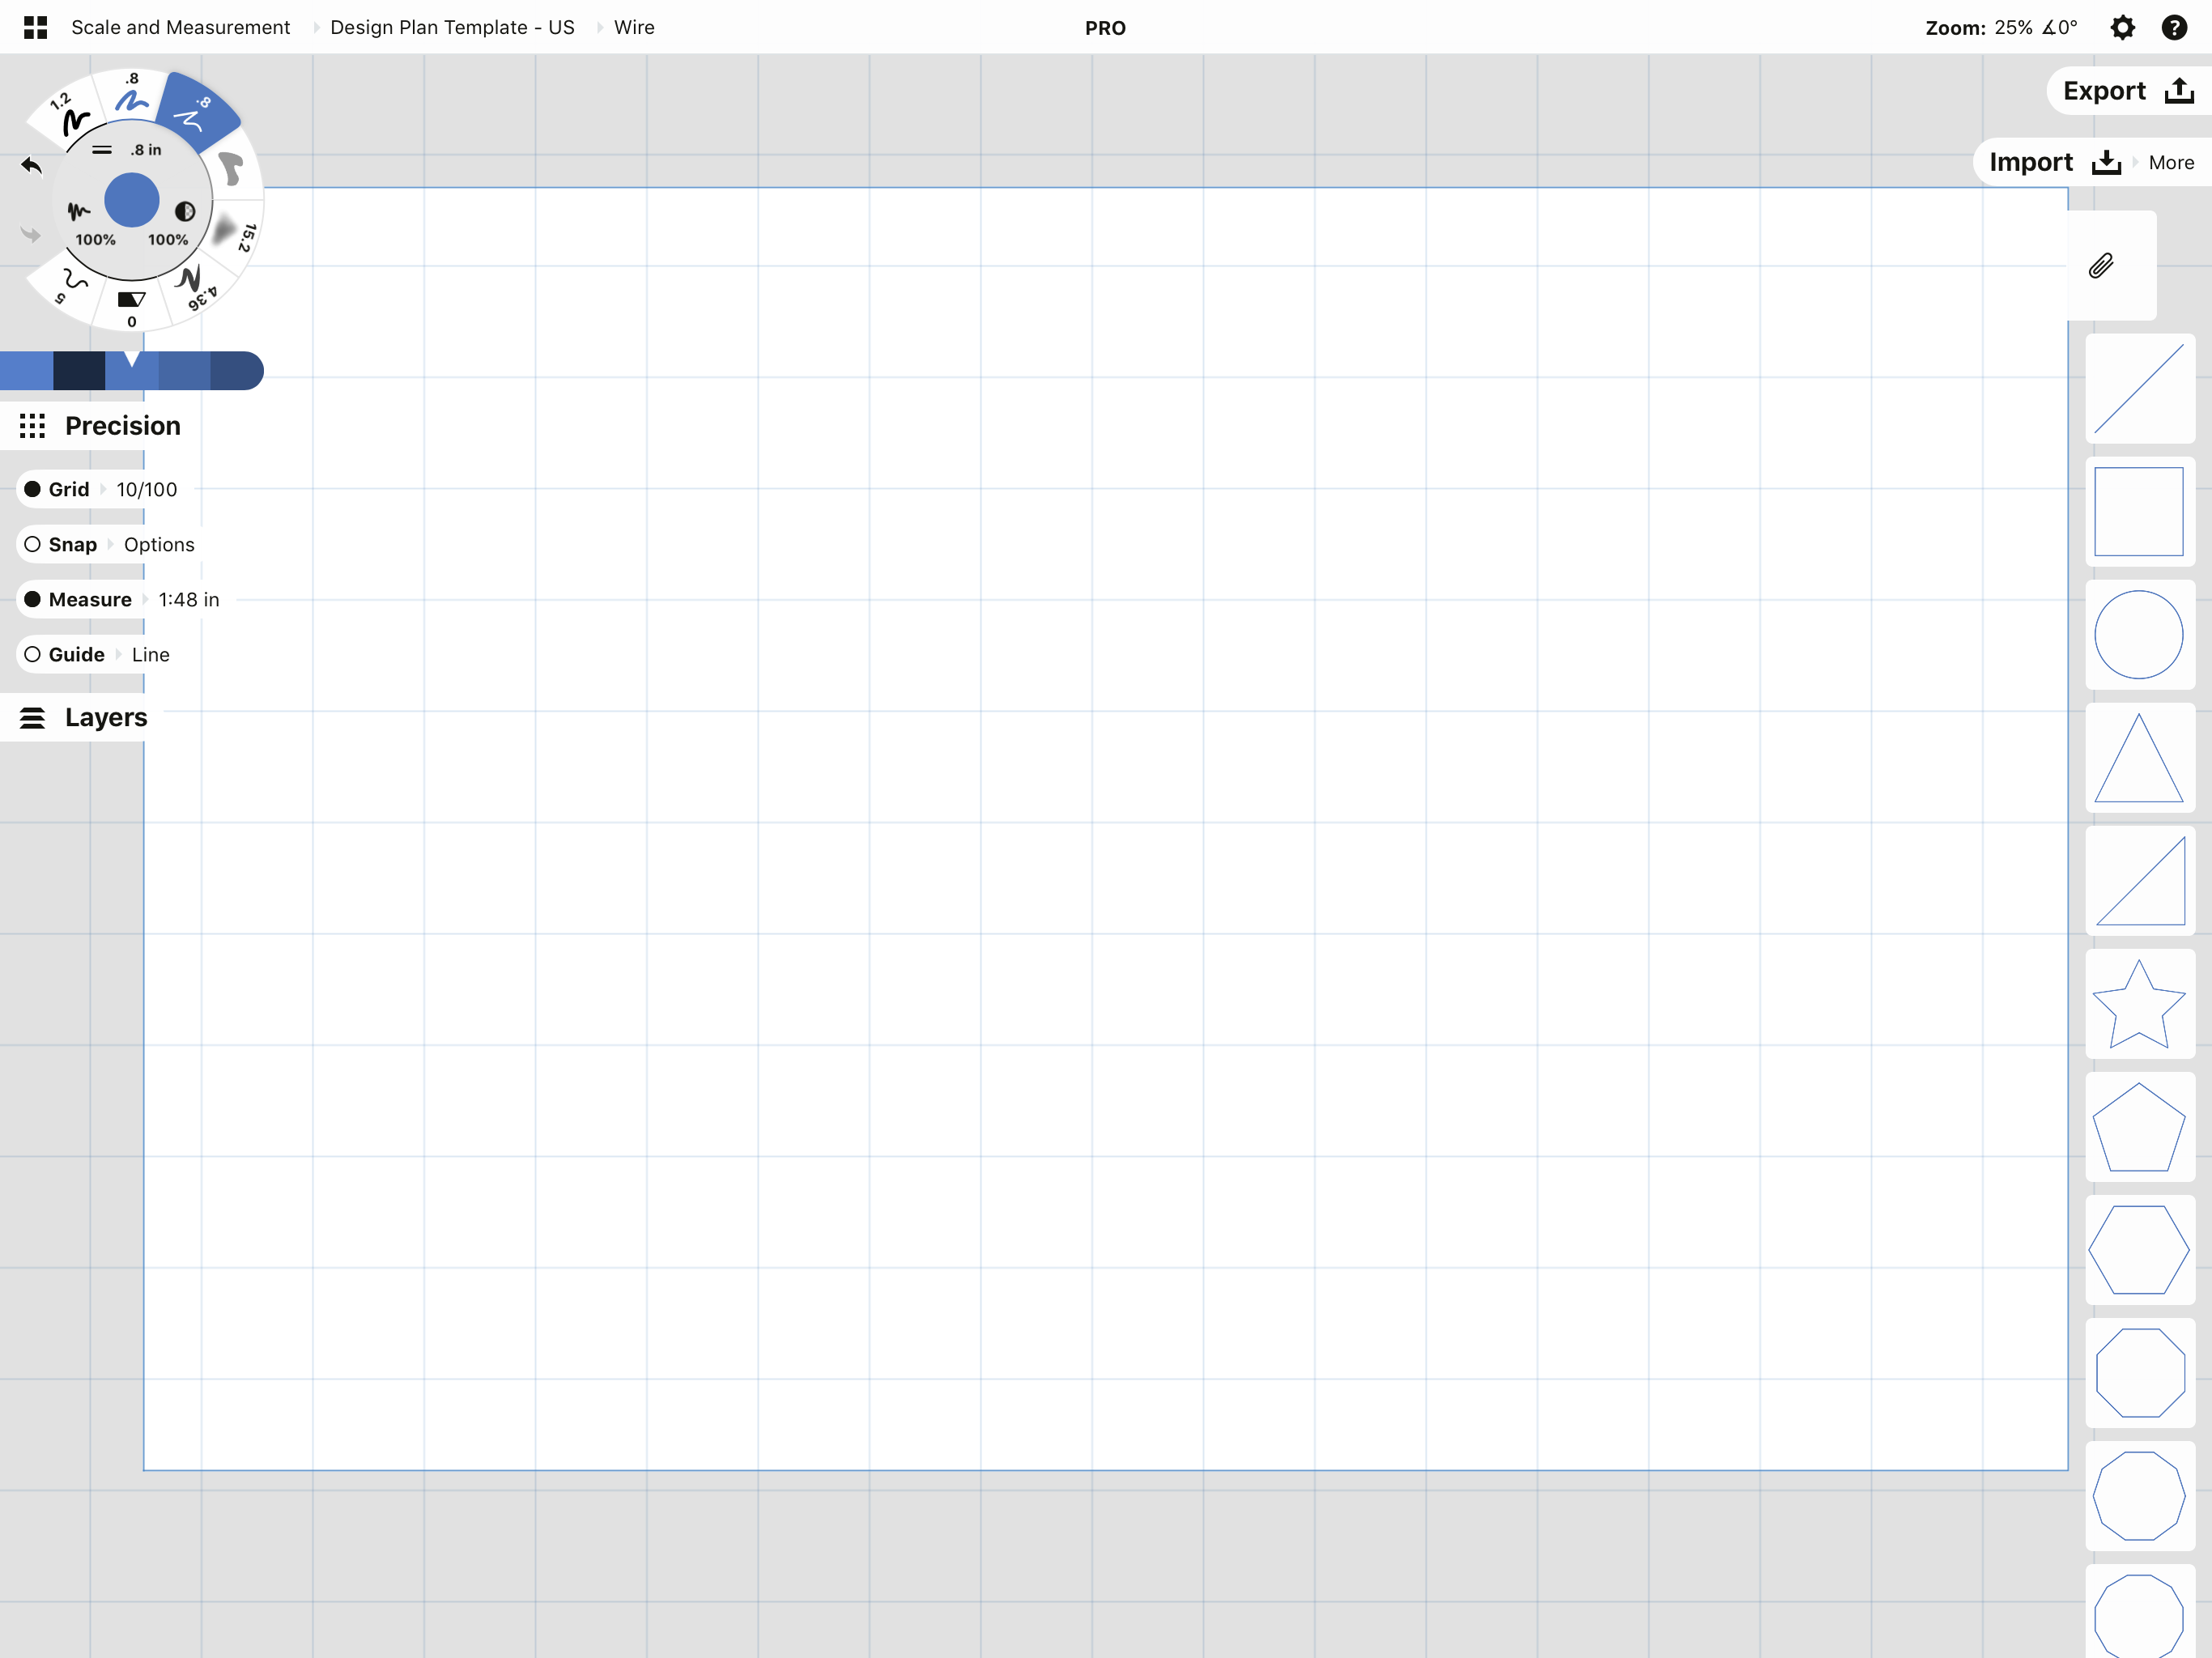 templates_designplan_imperial.PNG